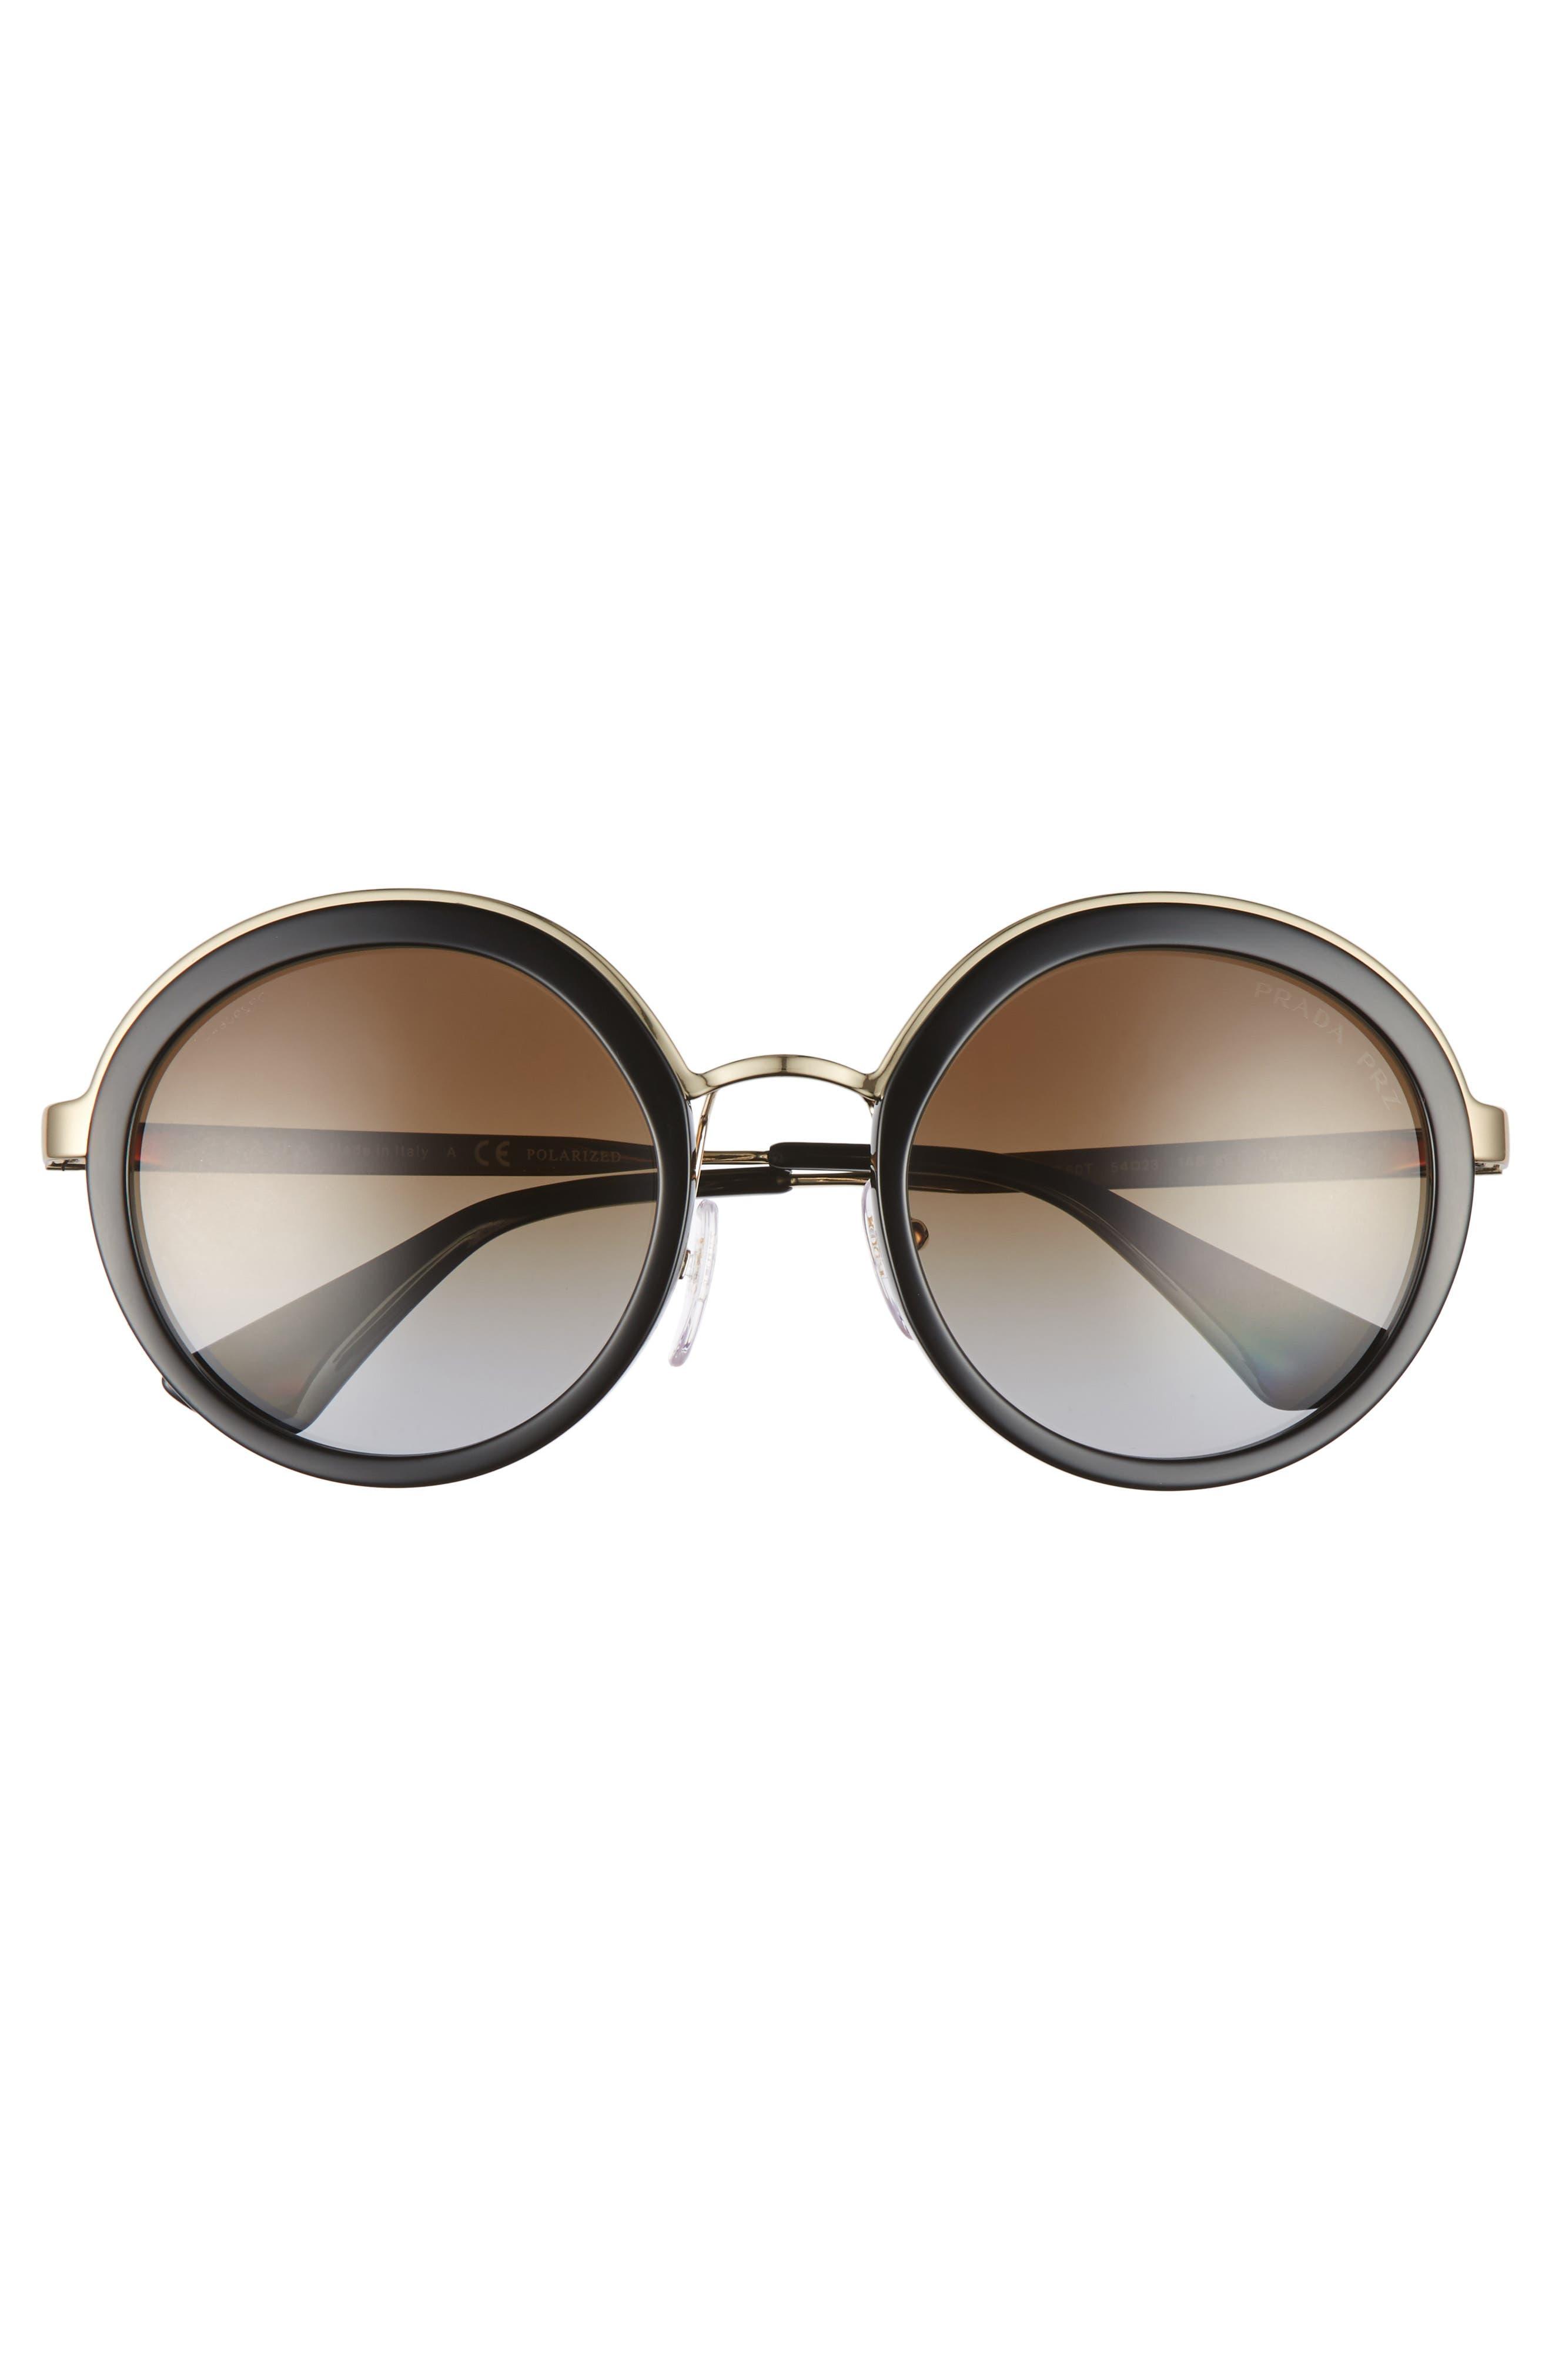 54mm Polarized Round Sunglasses,                             Alternate thumbnail 3, color,                             001